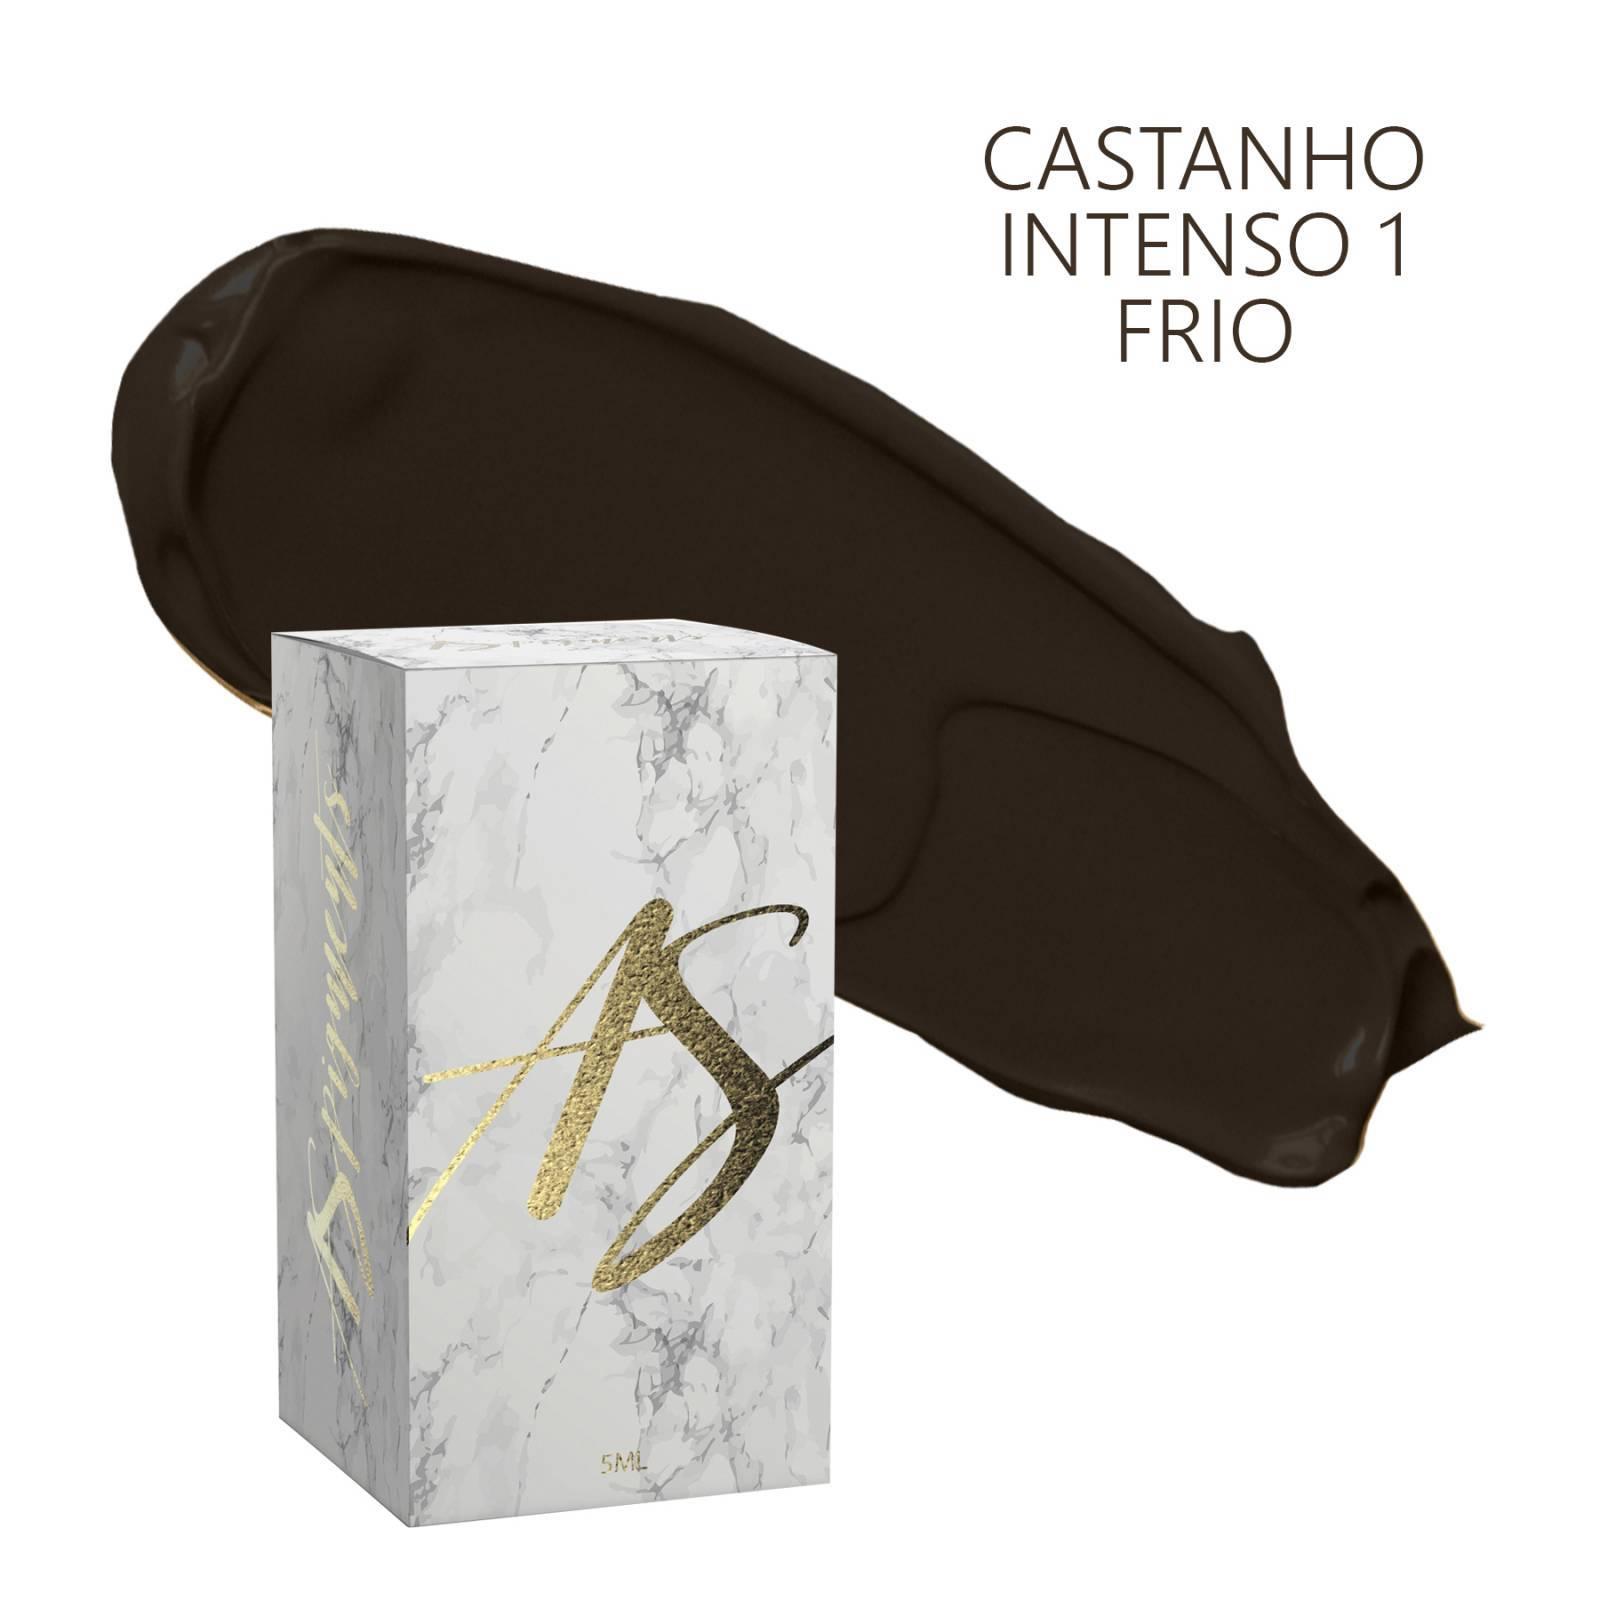 Pigmento Castanho intenso 1 frio- embalagem 5 ml - Loja Ana Paulla